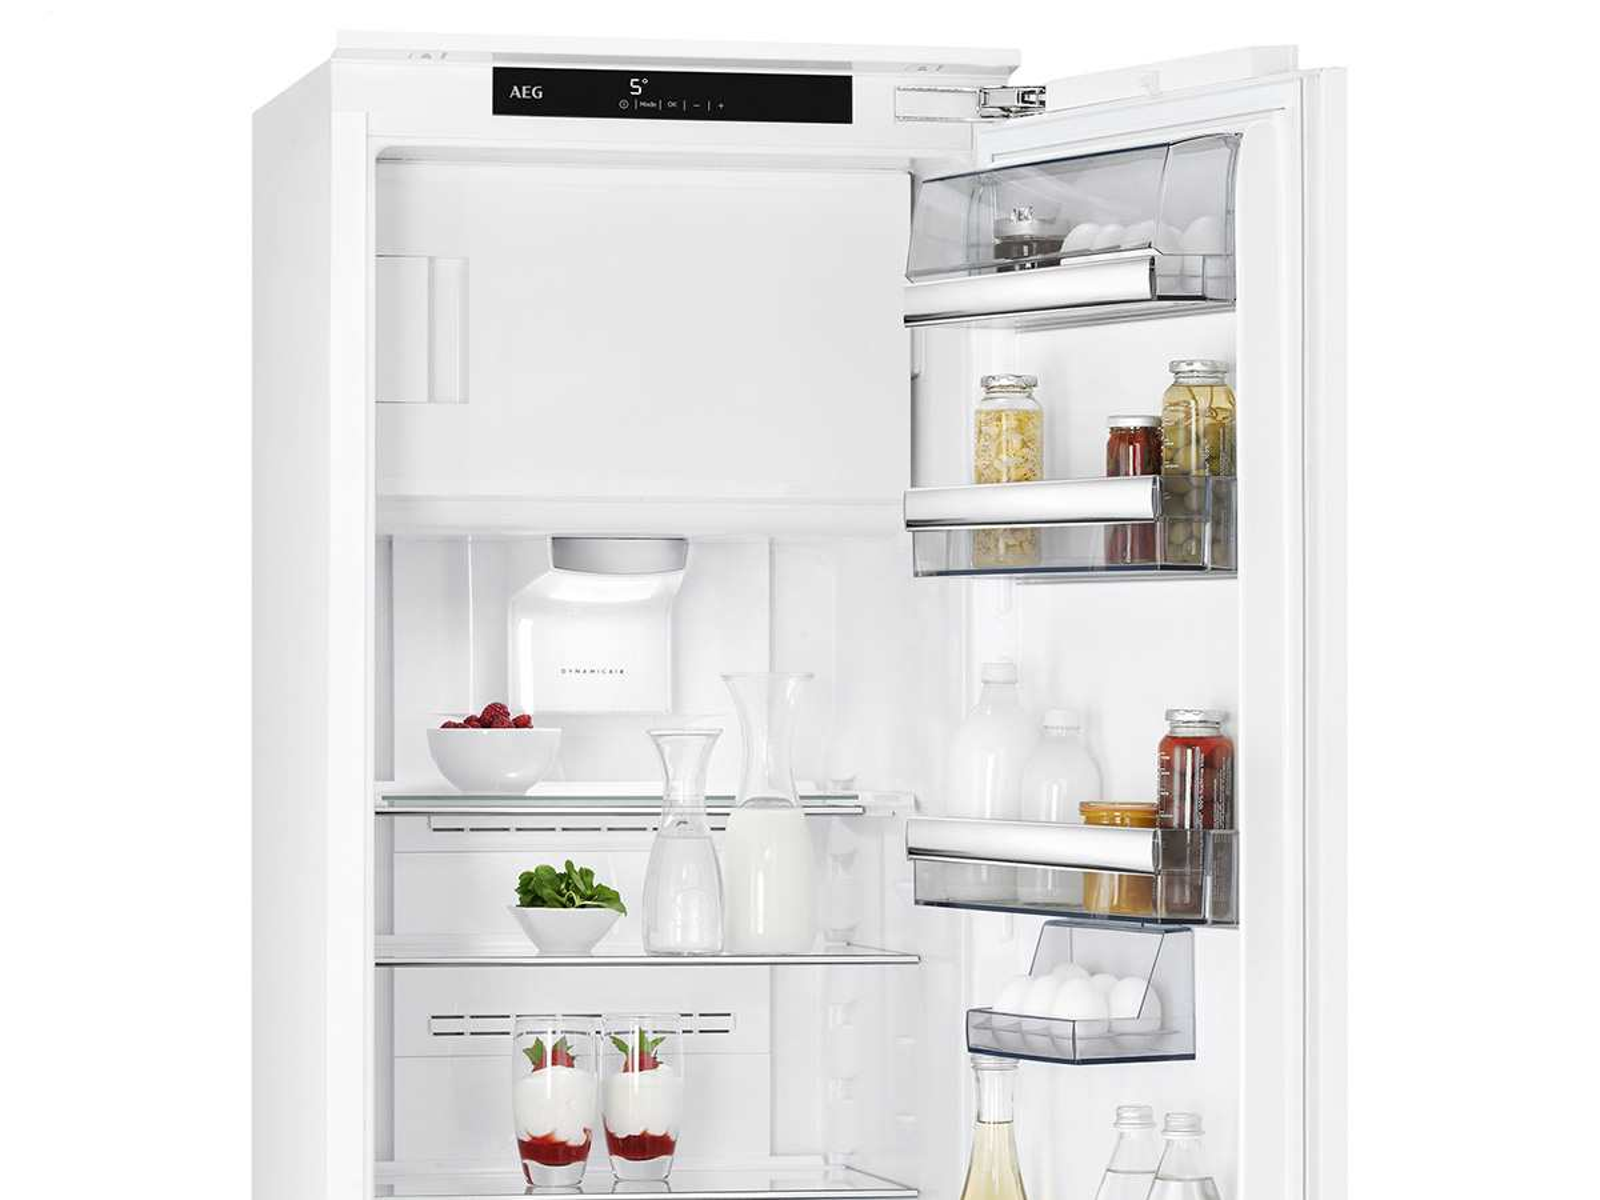 Smeg Kühlschrank Innenansicht : Aeg sfe zc einbaukühlschrank